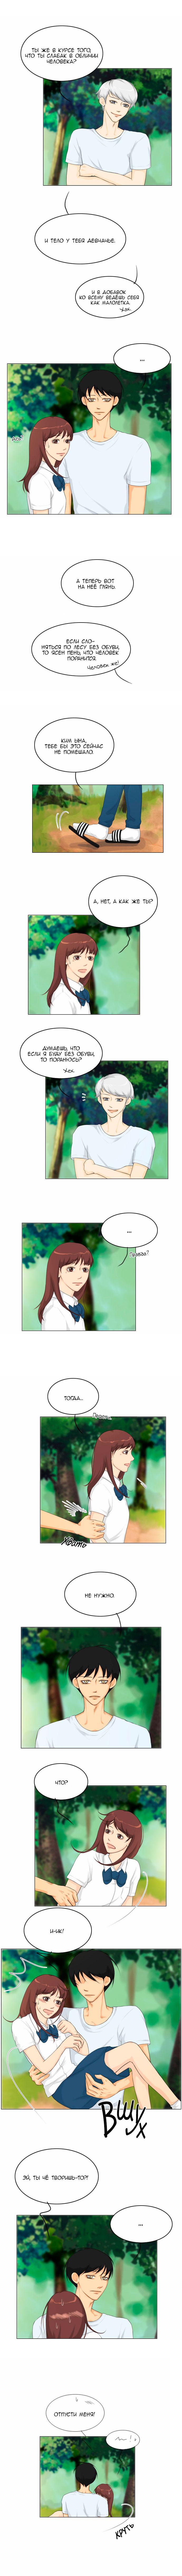 https://r1.ninemanga.com/comics/pic2/8/31048/426339/1535044241330.jpg Page 3